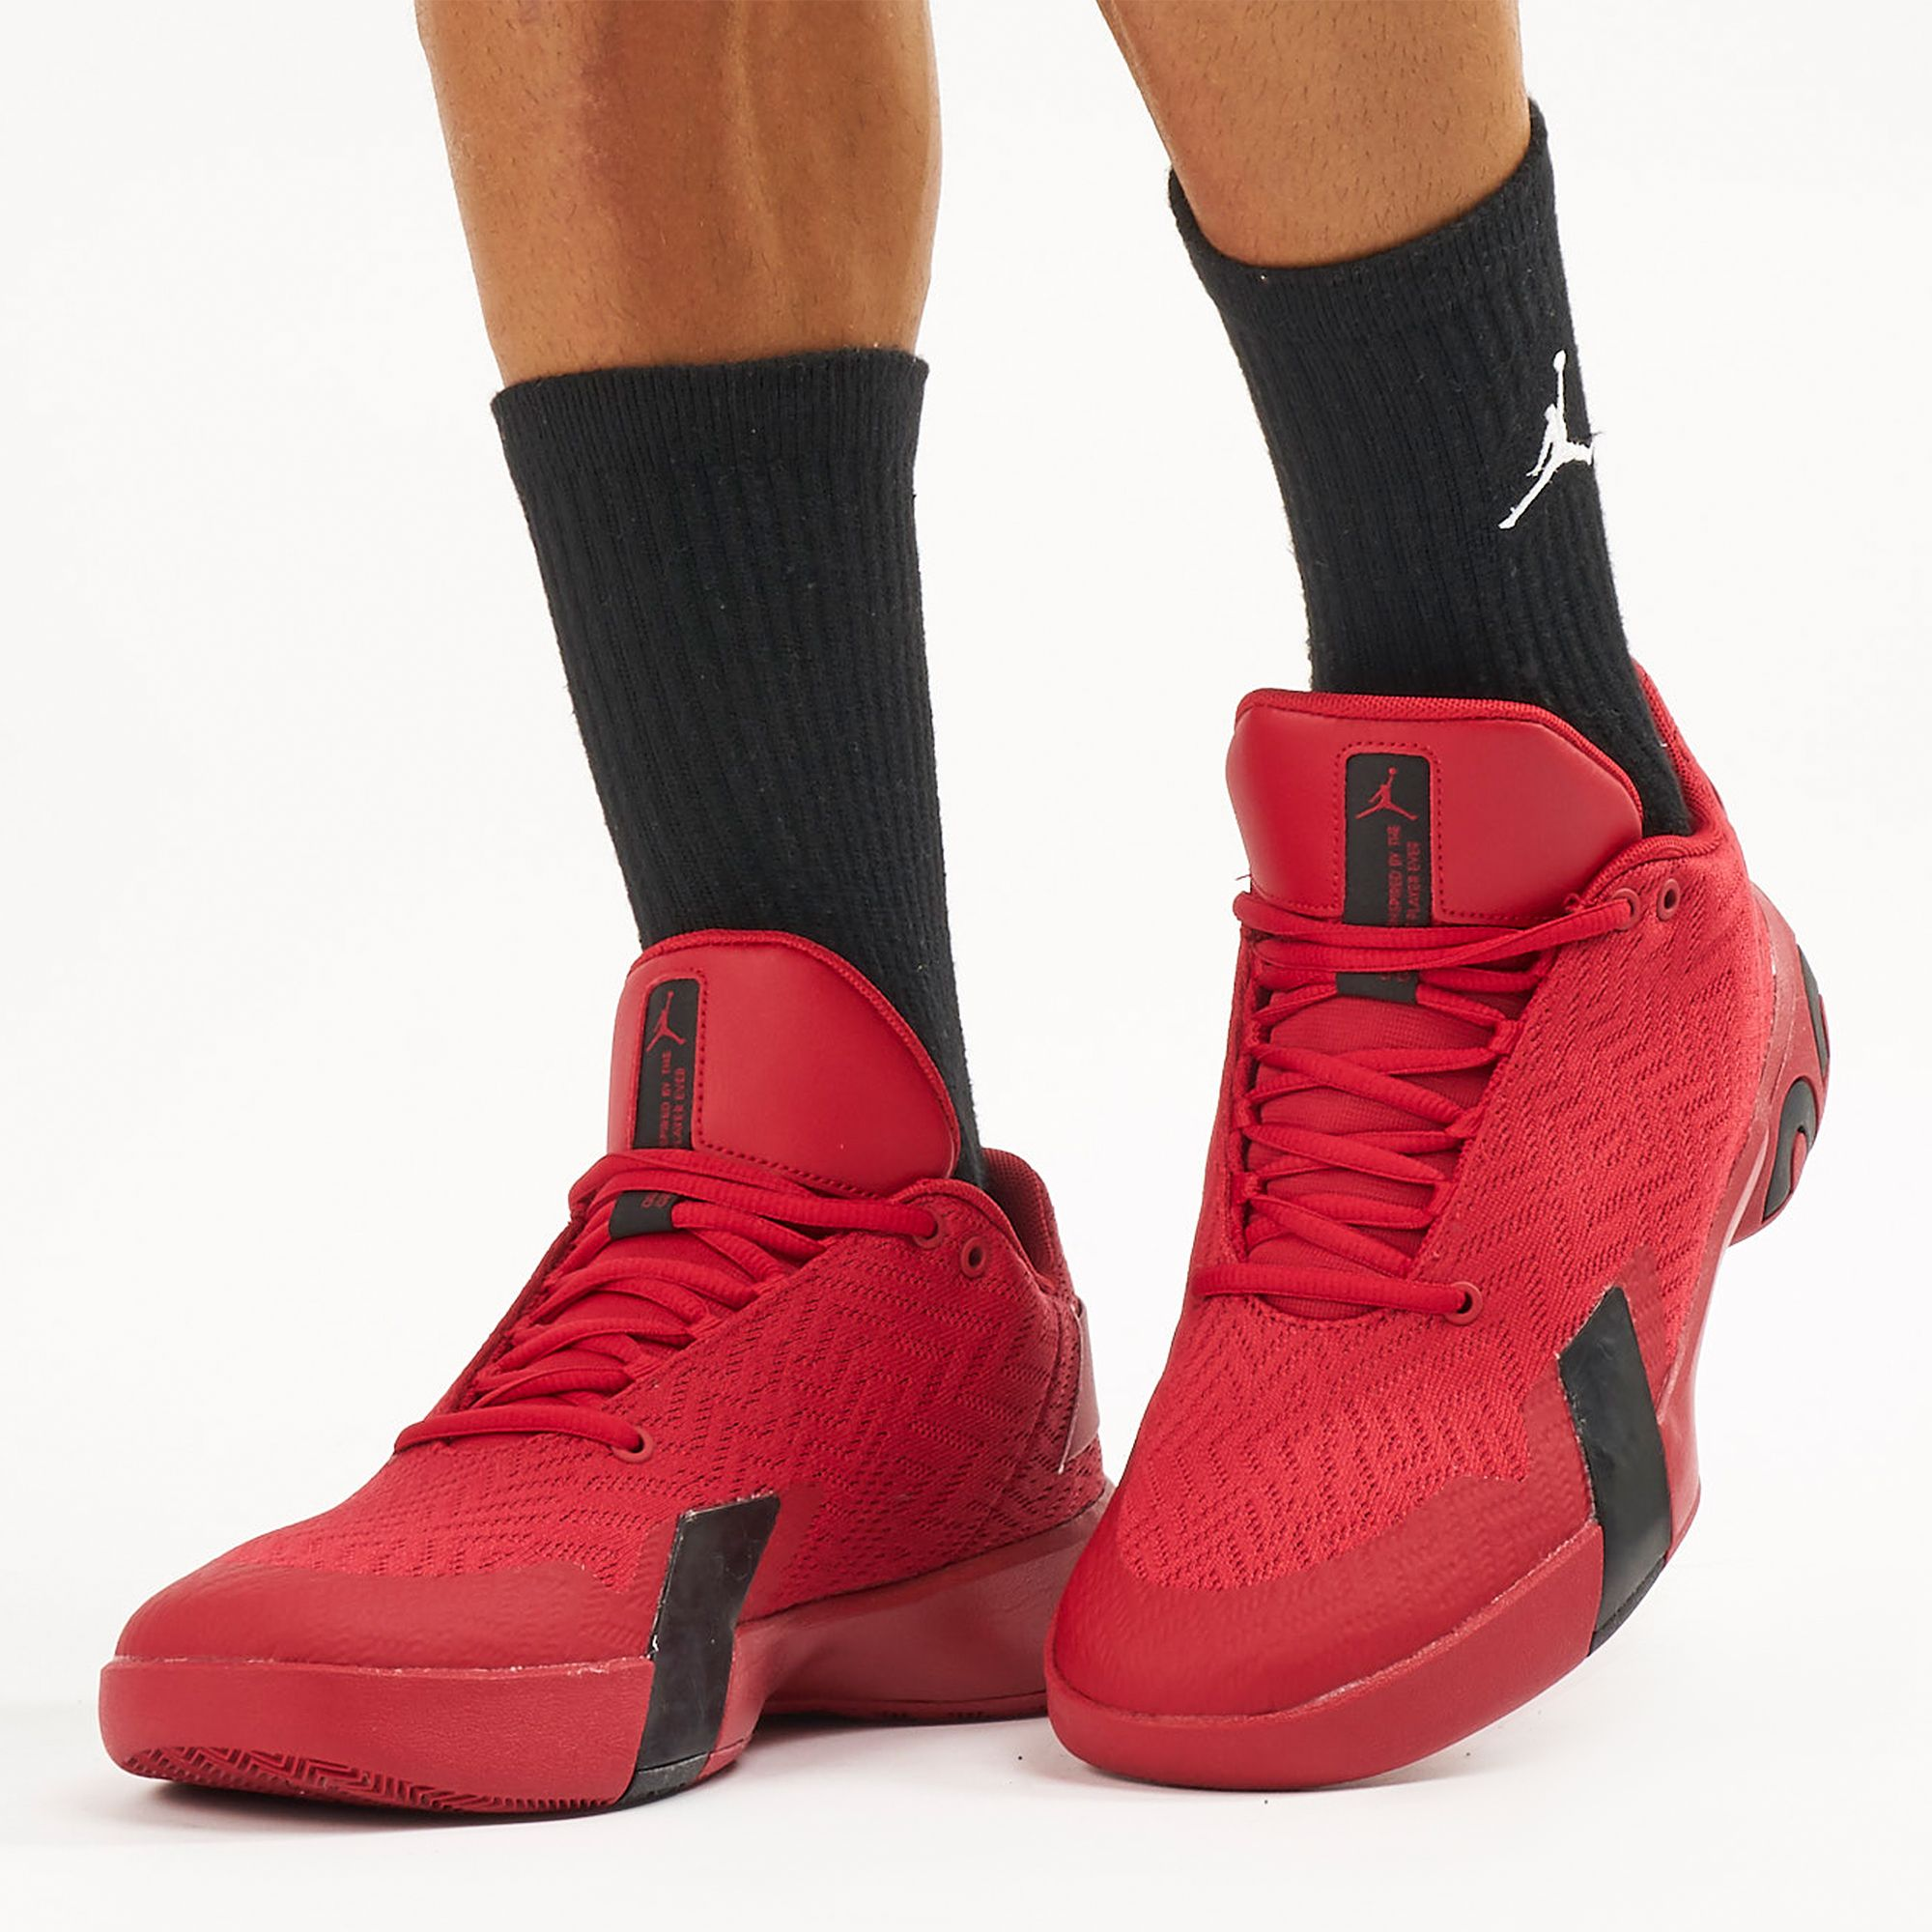 9c9a04eb8c8f Jordan Ultra Fly 3 Low Shoe